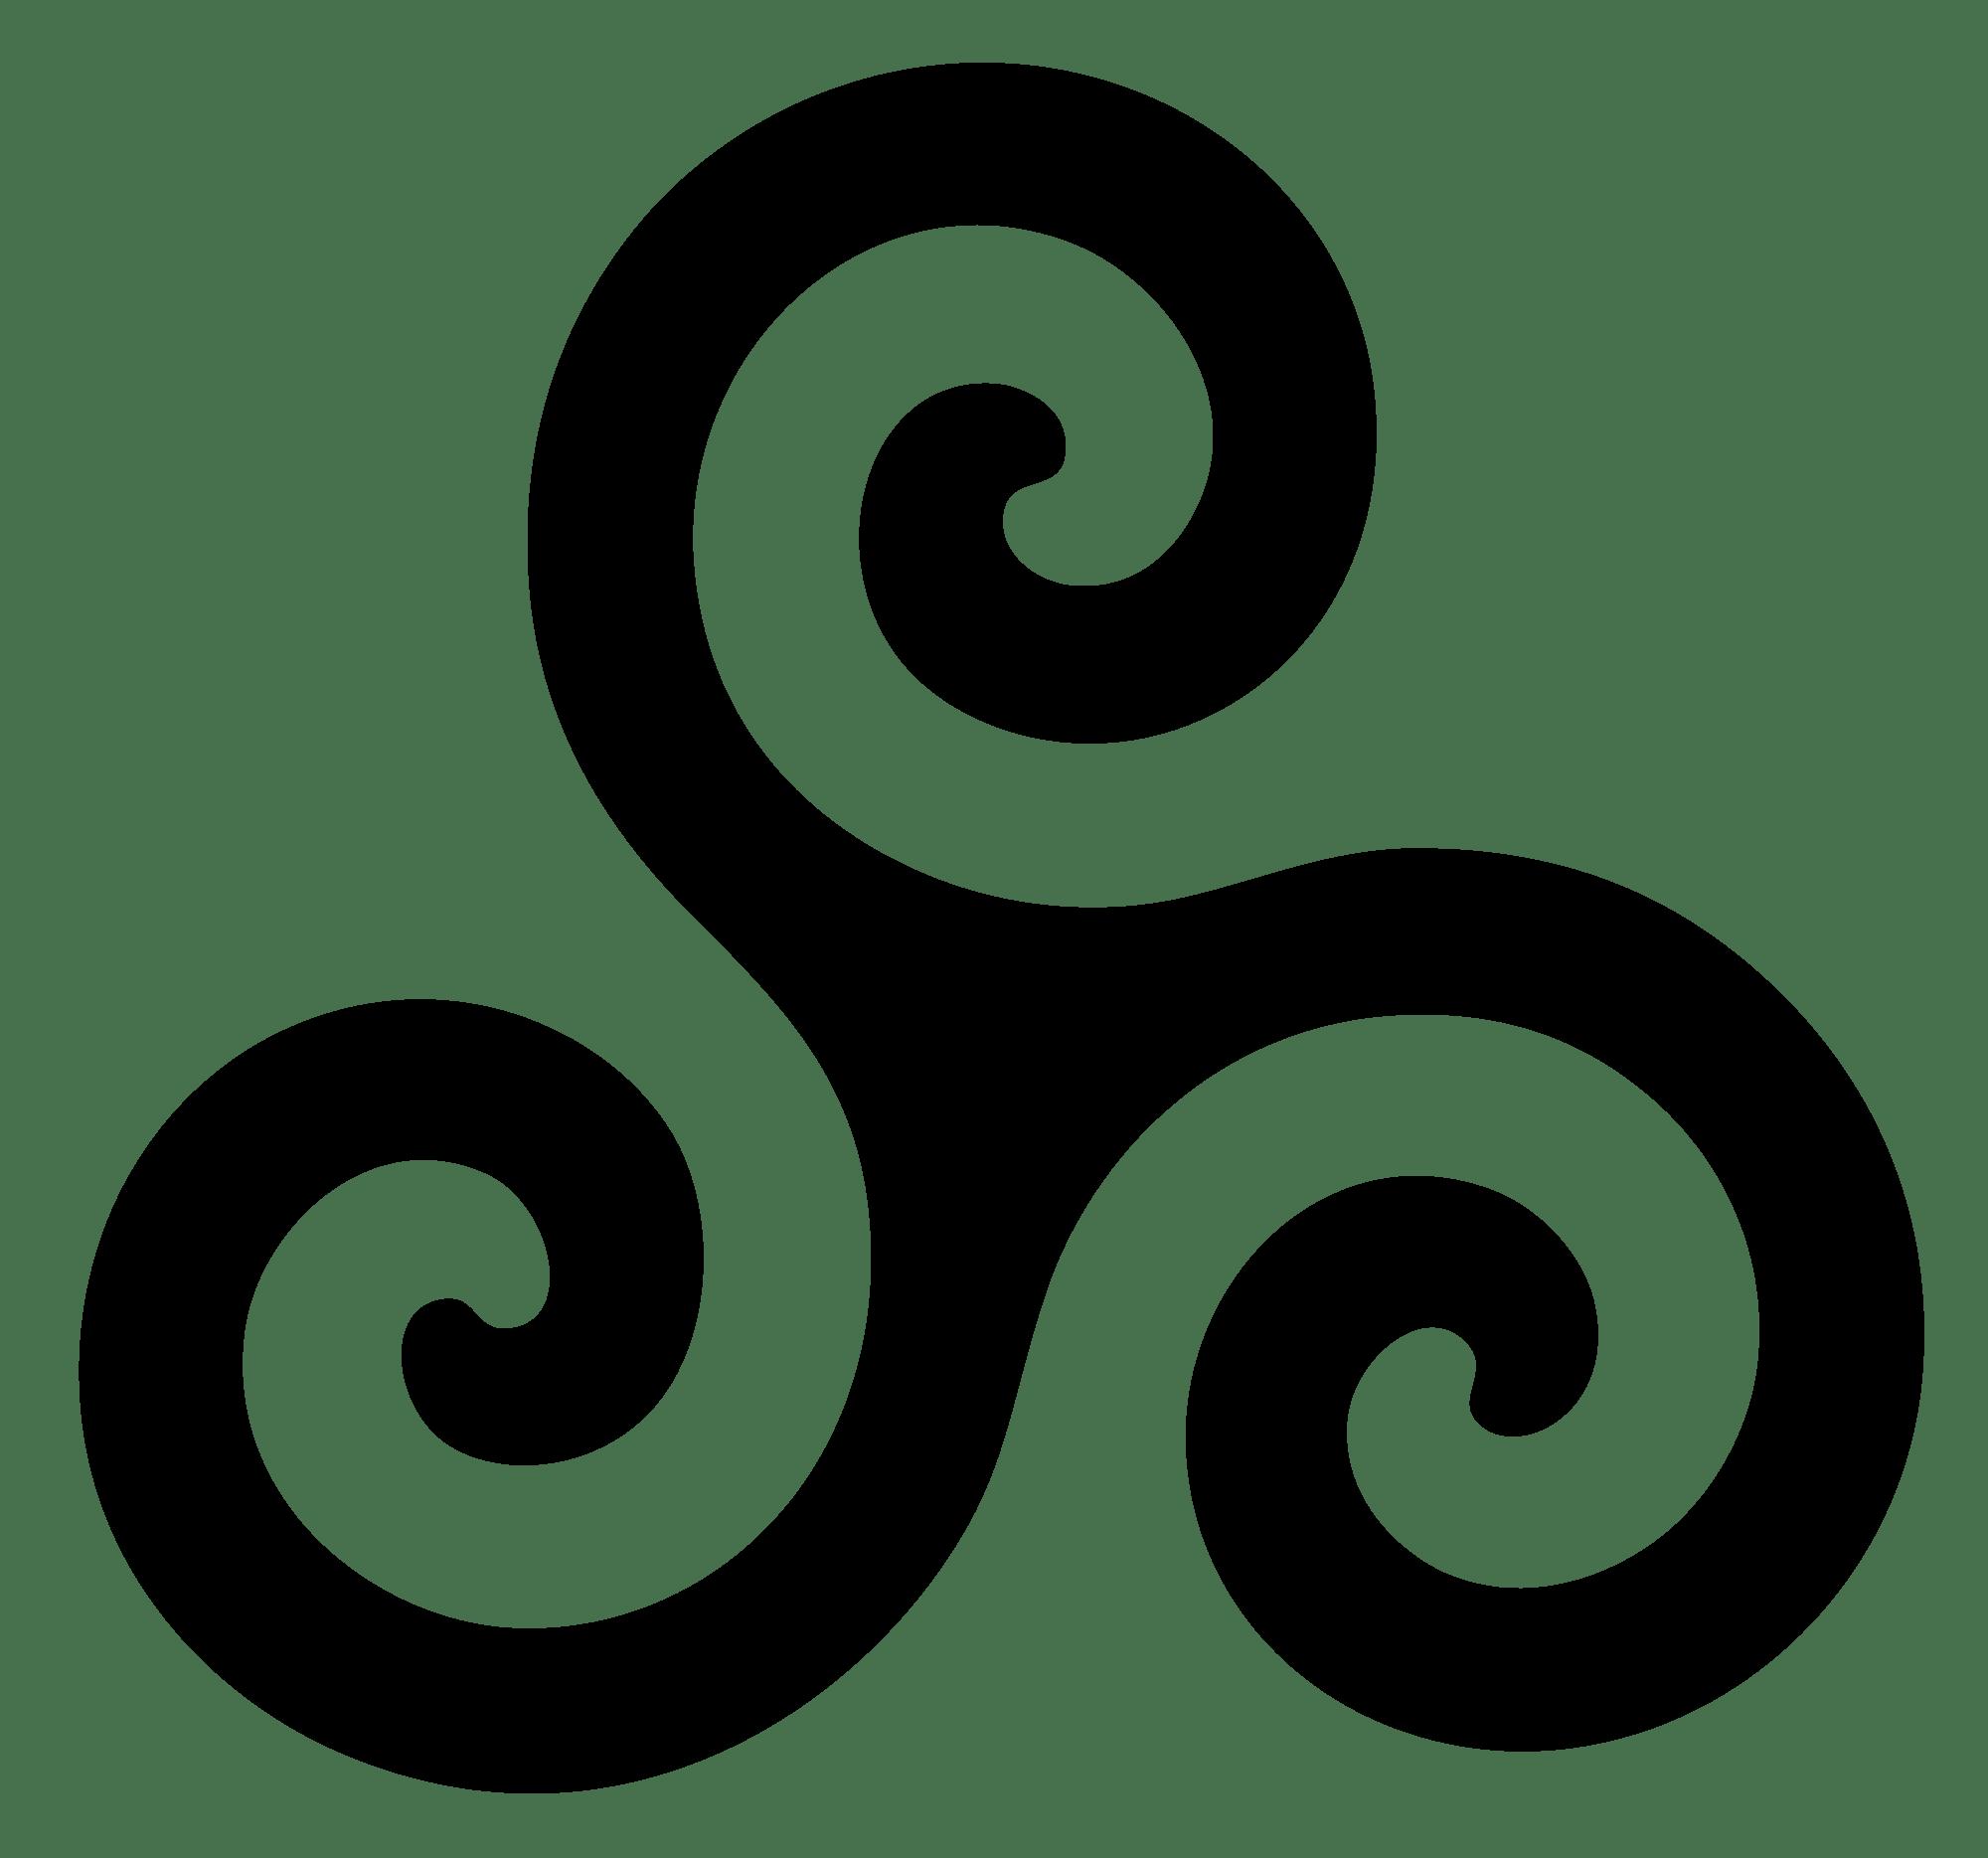 Irish Symbols And Meanings Chart Heartpulsar